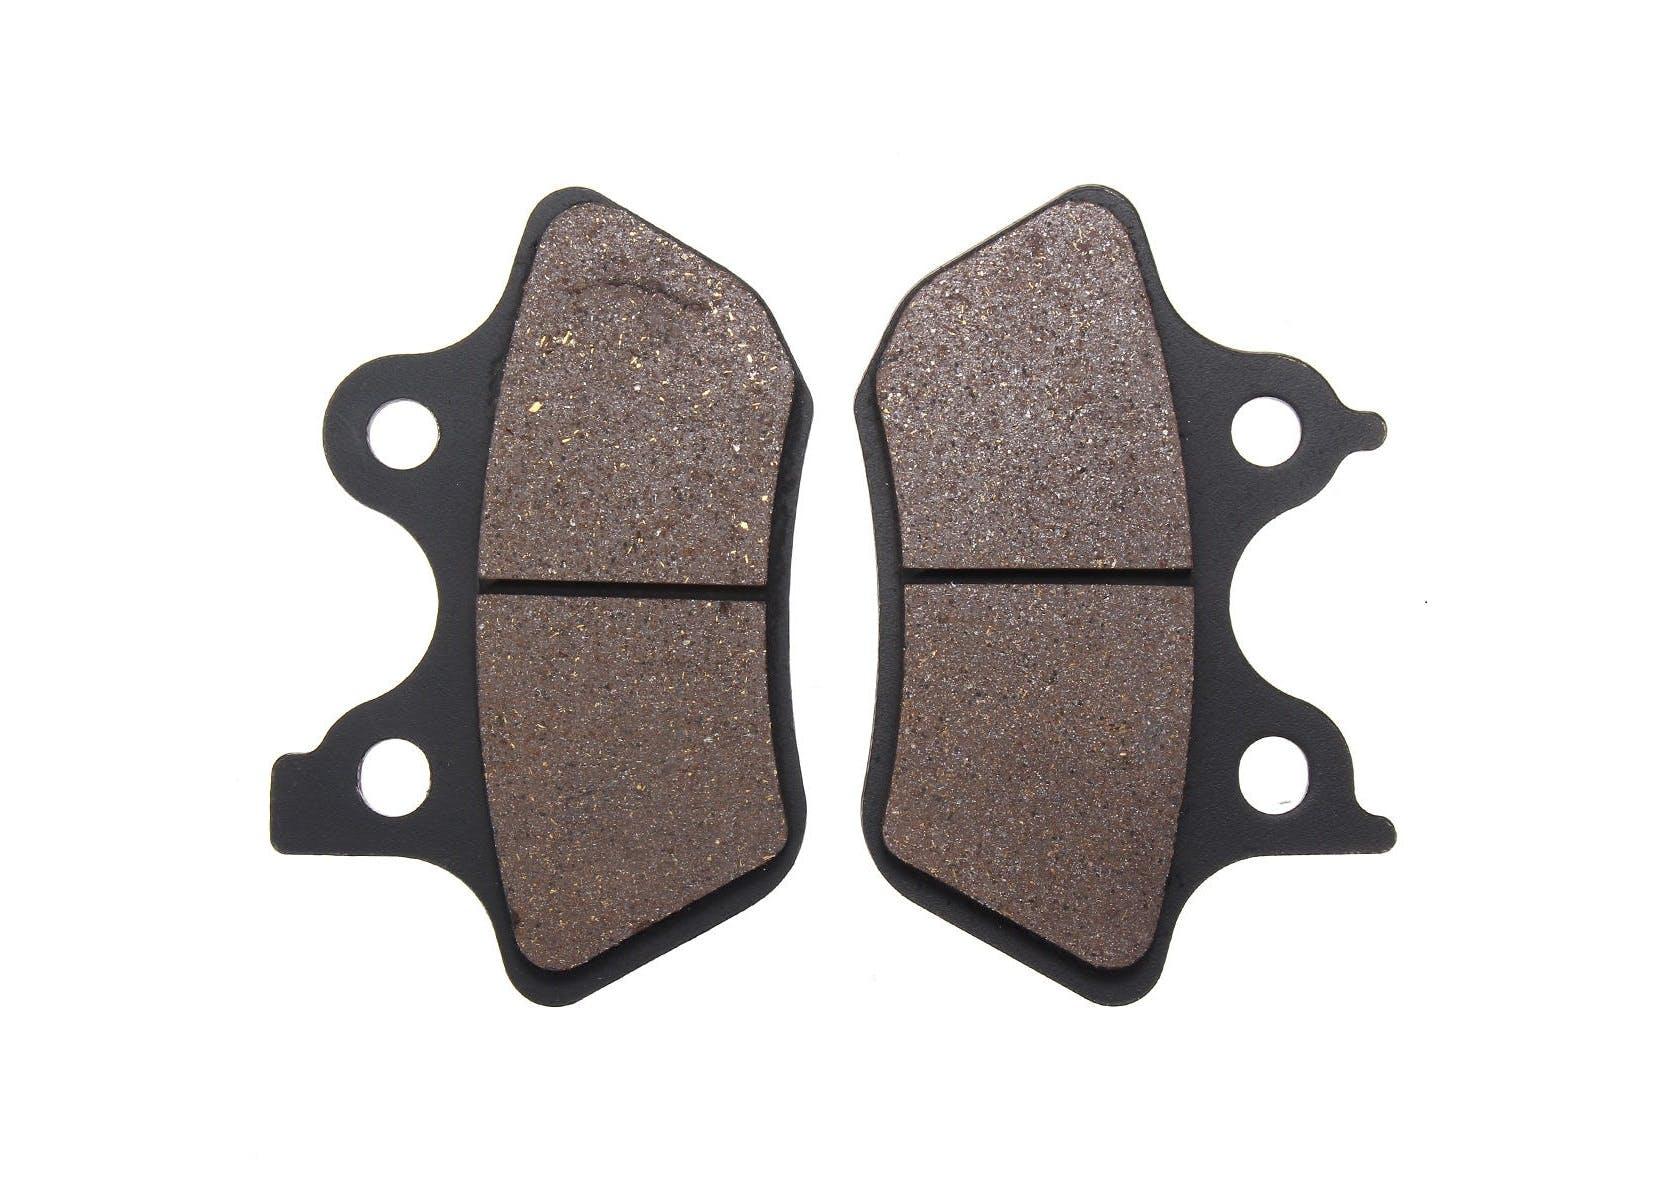 A brand new set of brake pads